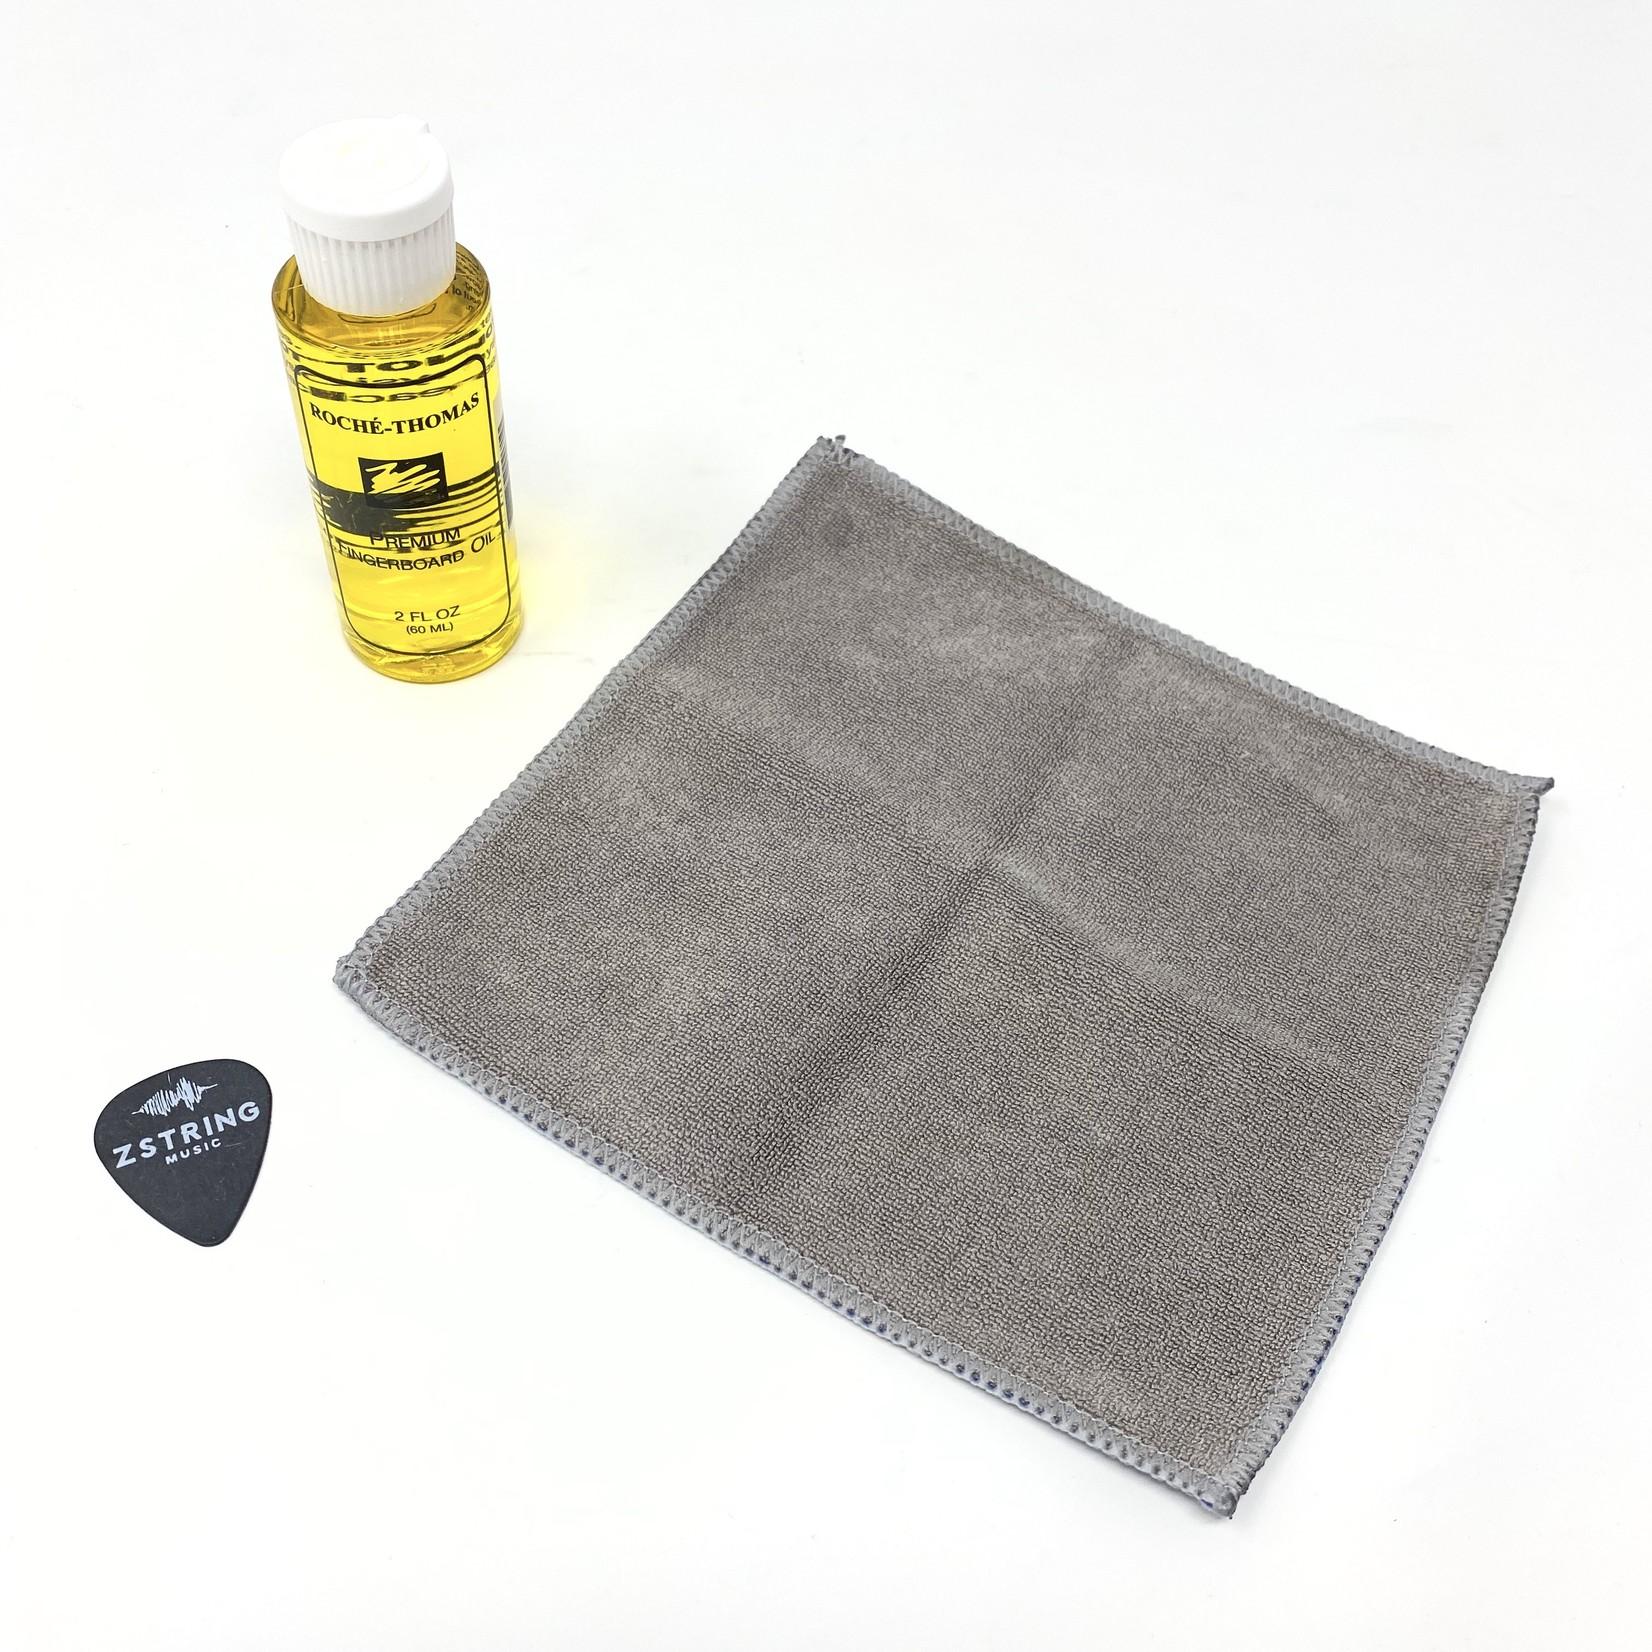 Roche-Thomas RochŽ-Thomas Premium Fingerboard/Fretboard Oil Kit - 2 Fl. Oz (60 mL) + Premium Polish Cloth (Roche)